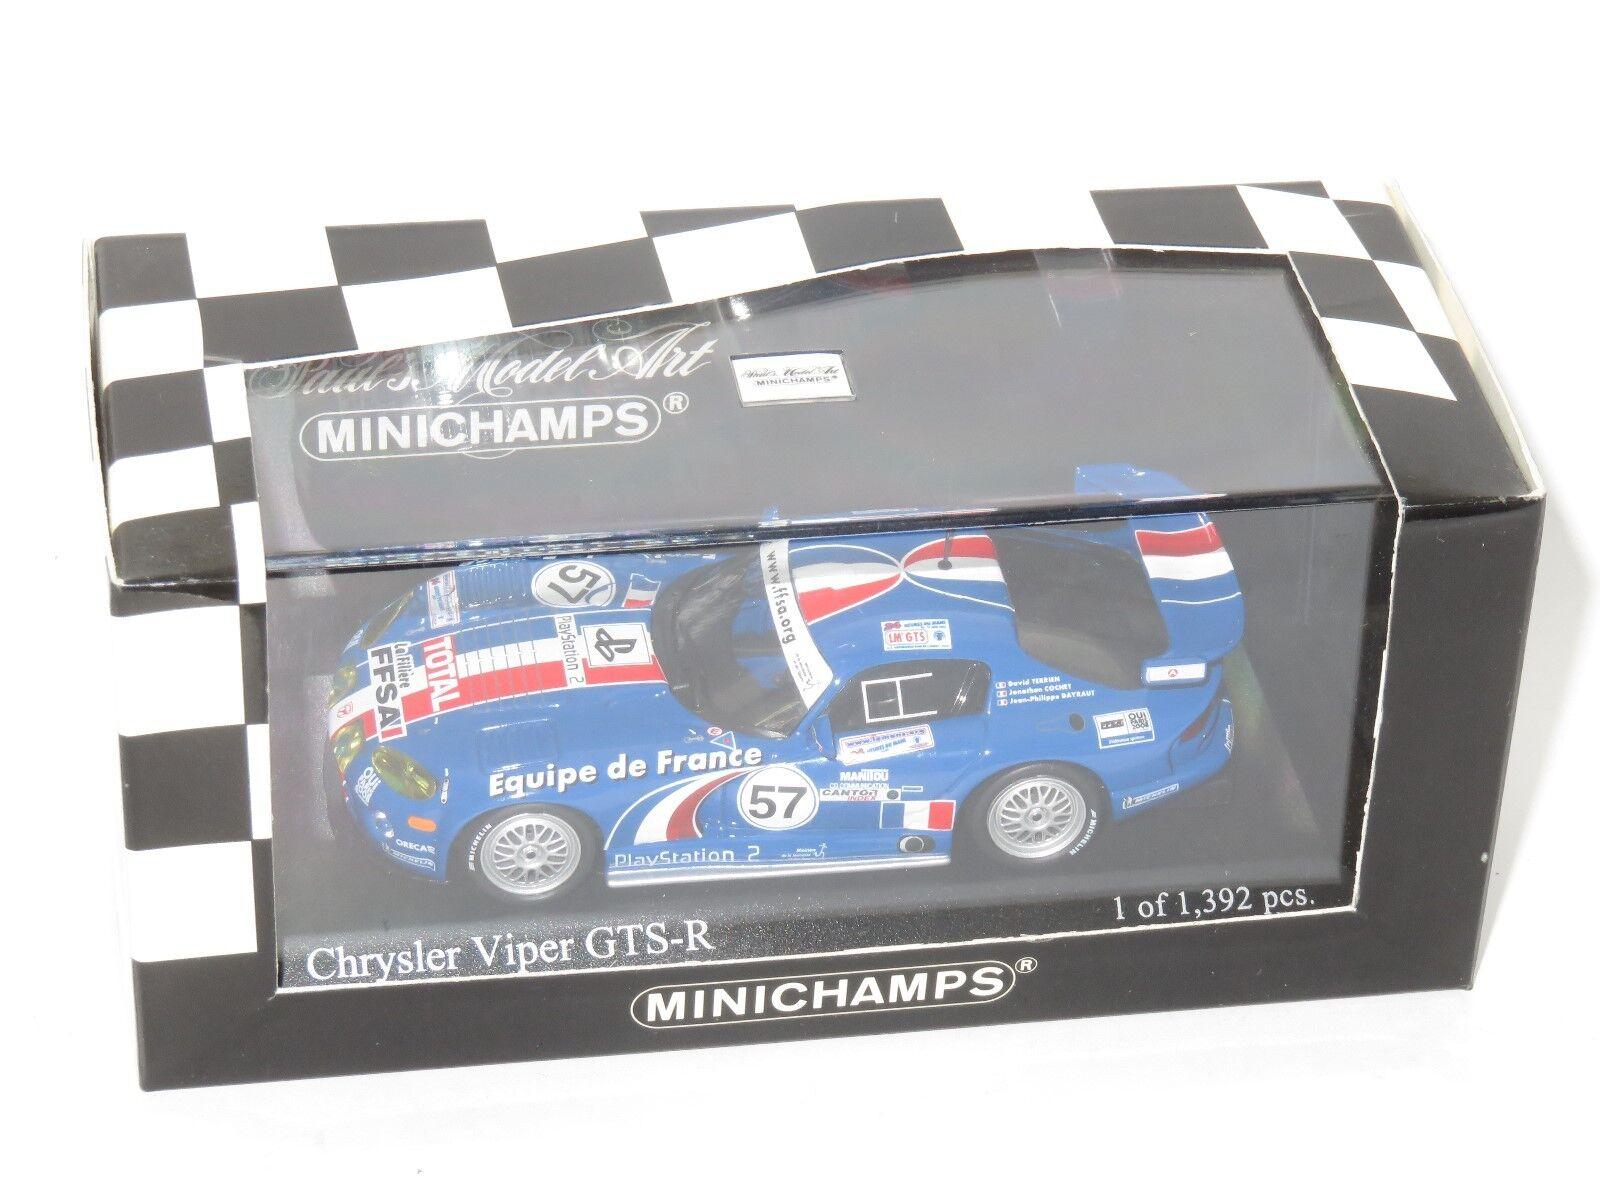 Chrysler Viper GTS-R EQUIPE DE FRANCE Ffsa LE MANS 24 ore 2001  57